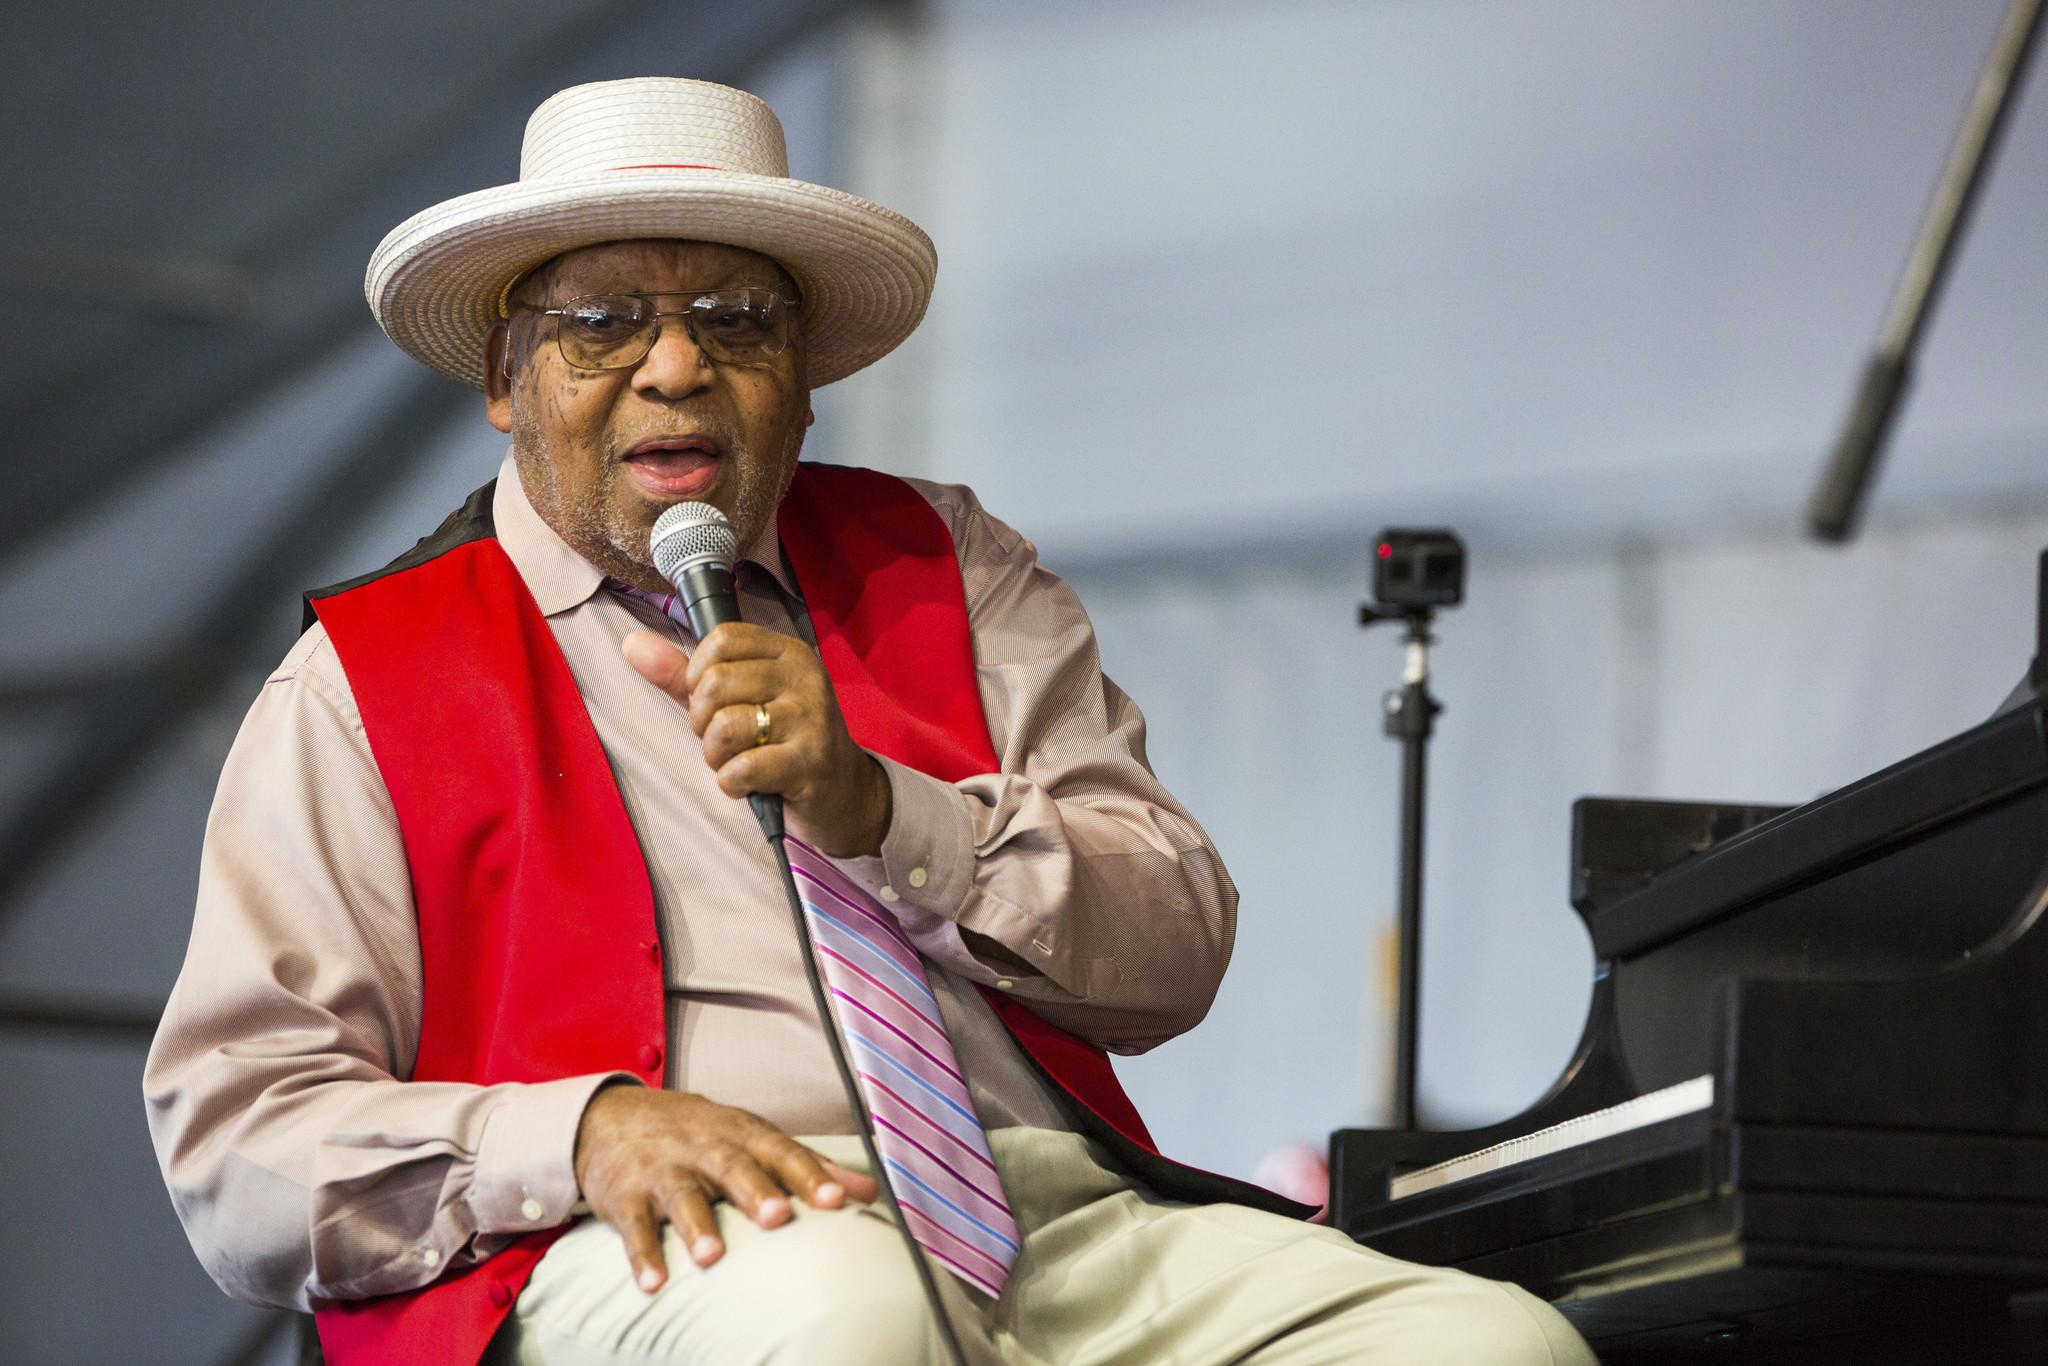 Jazz patriarch Ellis Marsalis dies after being hospitalized with coronavirus symptoms